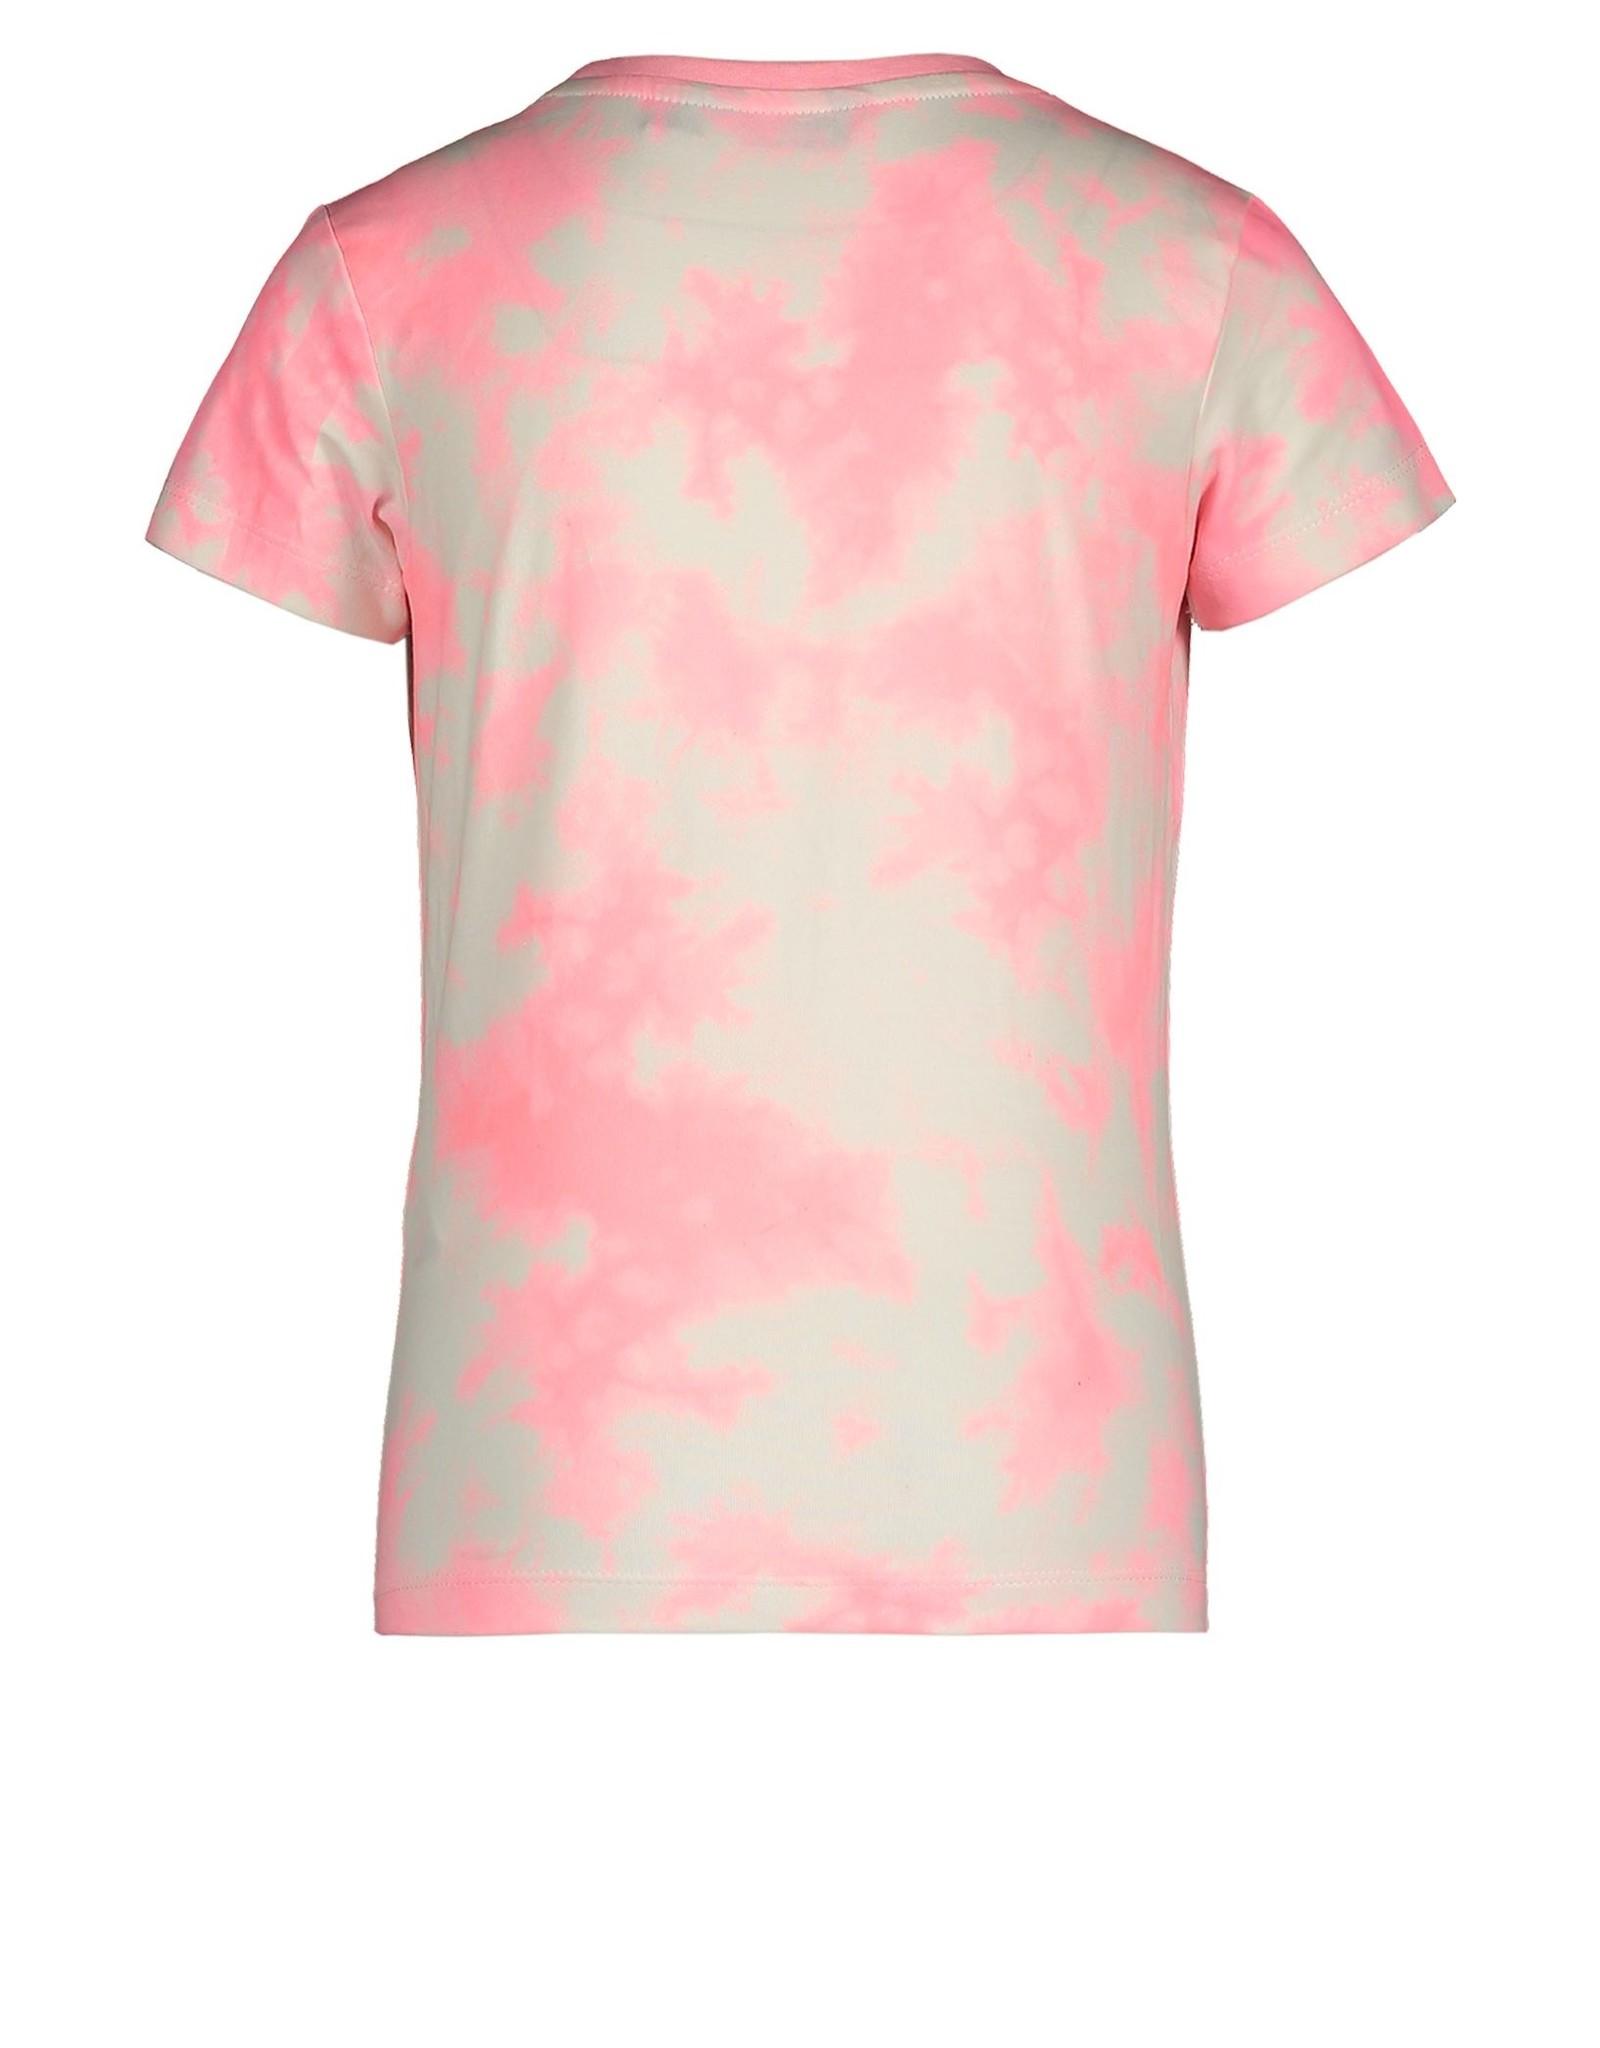 Moodstreet Moodstreet shirt 5404 Sparkling pink